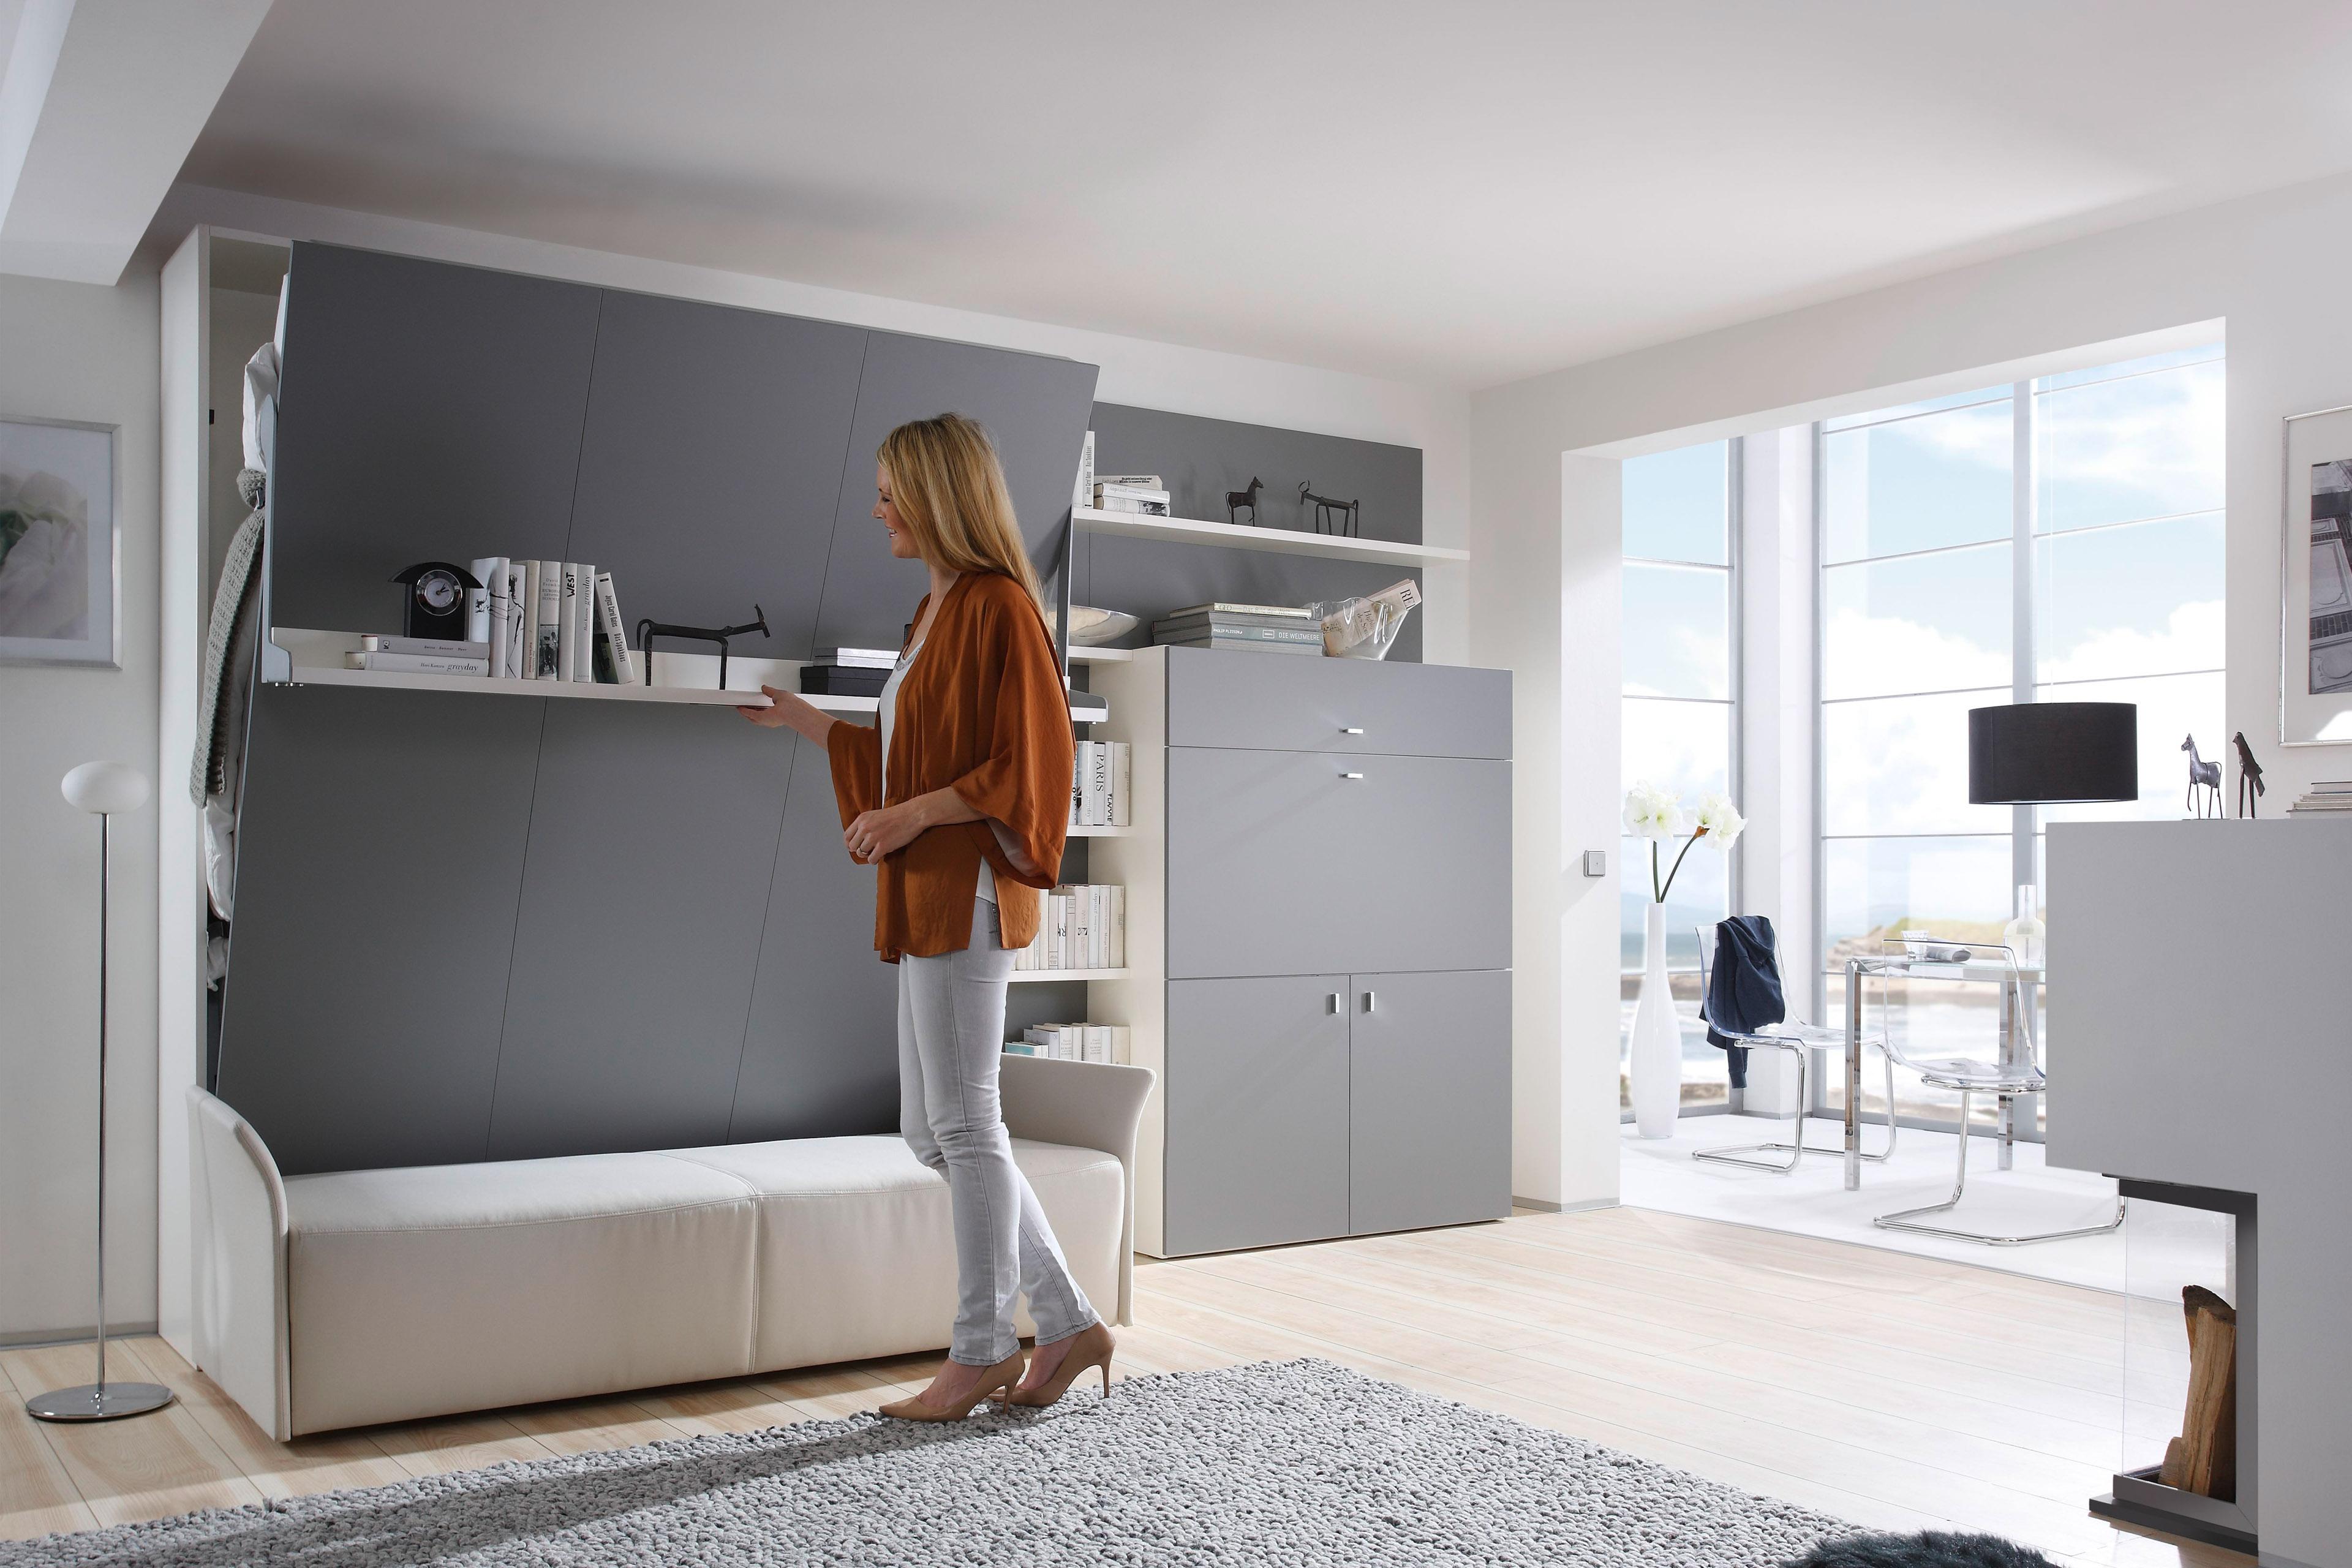 schrankbett berlin schrankbett berlin details zu. Black Bedroom Furniture Sets. Home Design Ideas